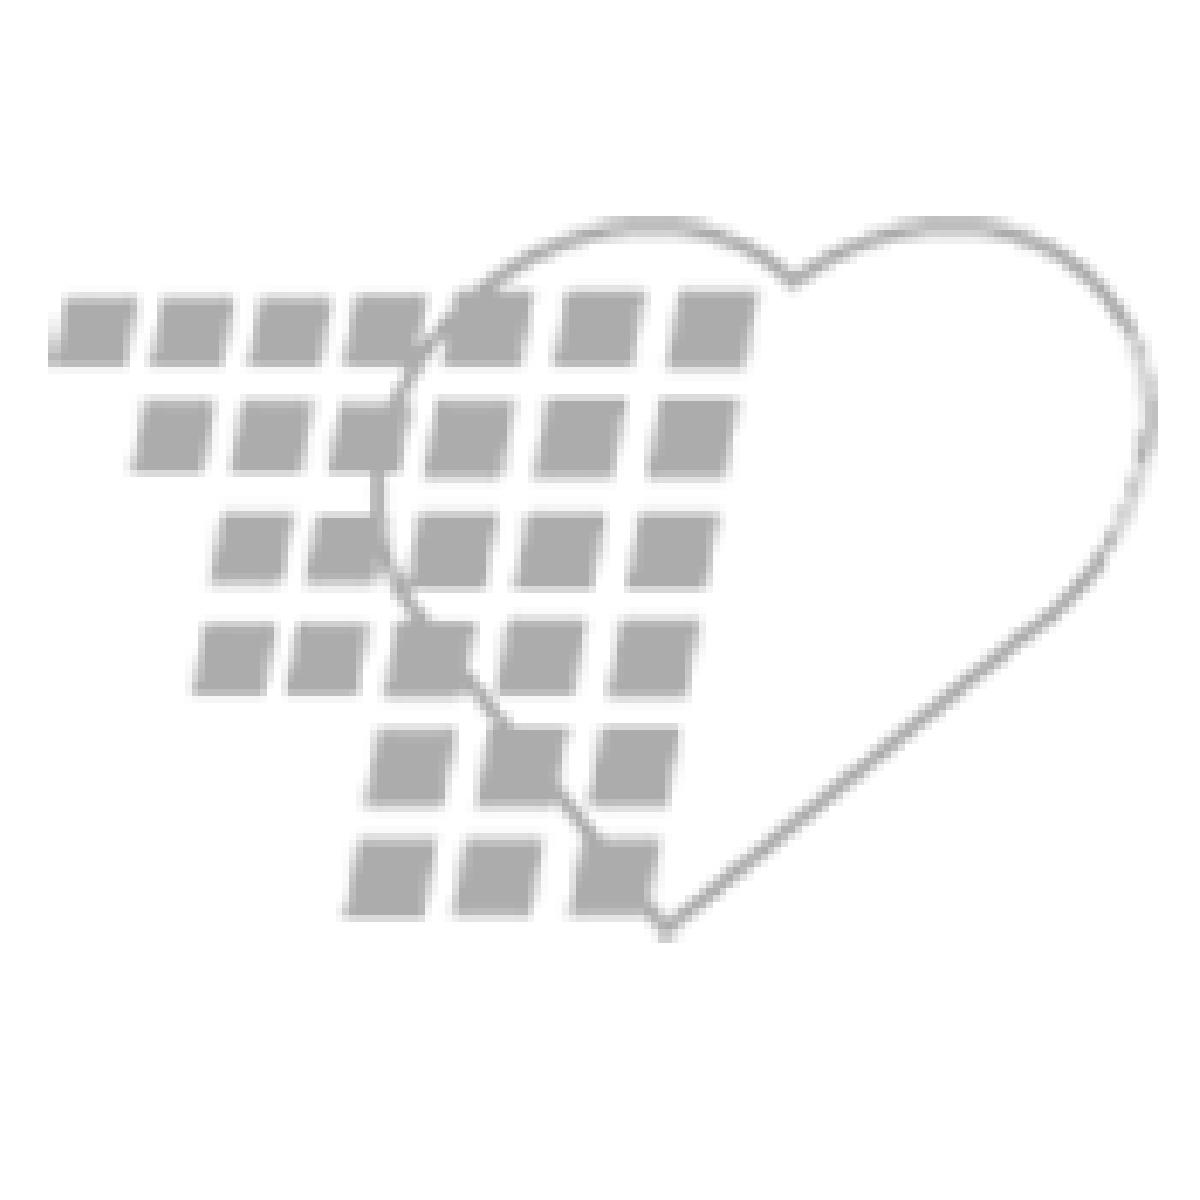 04-71-8239 - Utility Basket